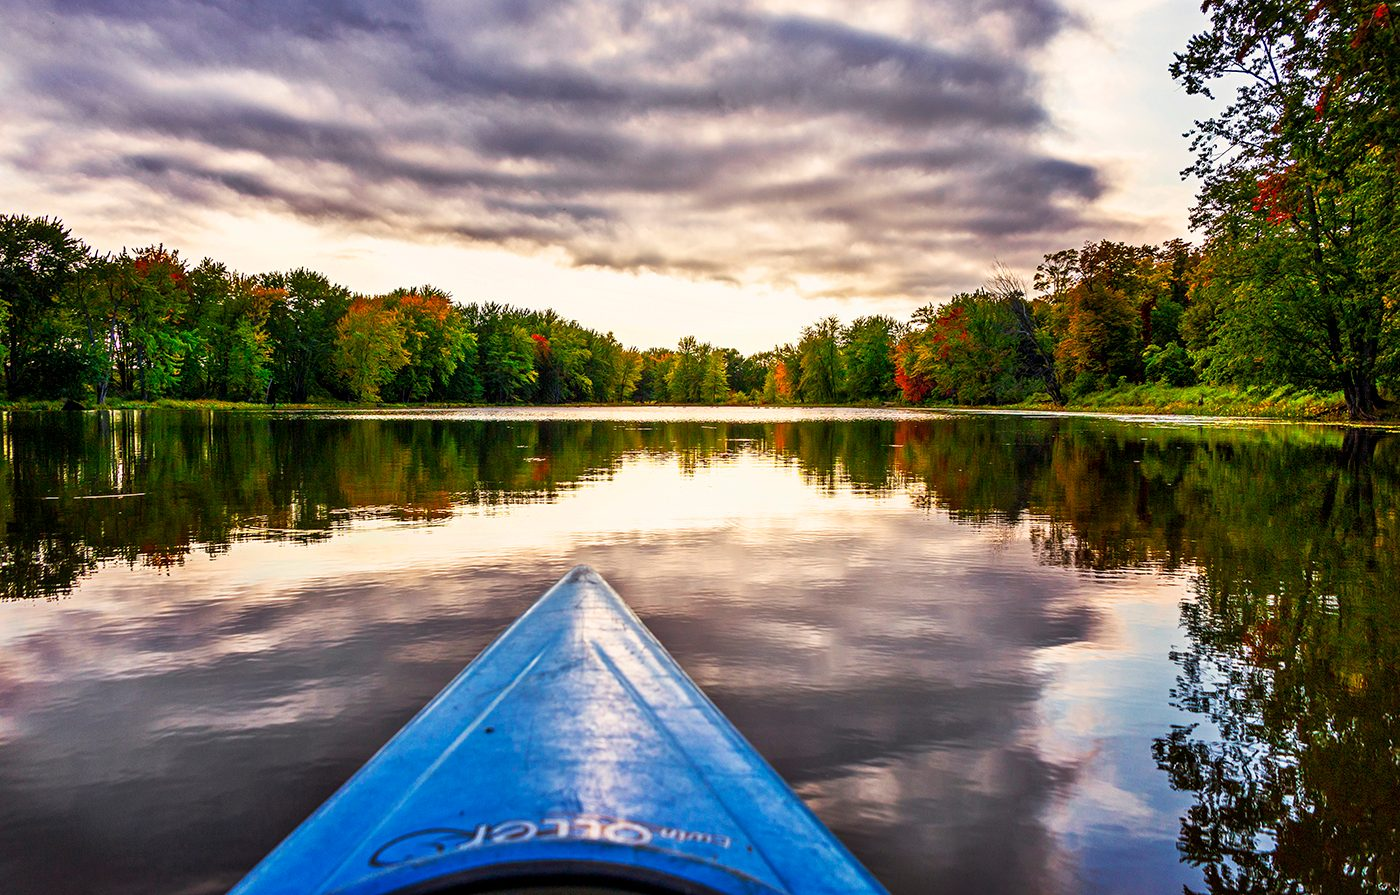 My Happy Place - Petrie Island Canoe On Lake